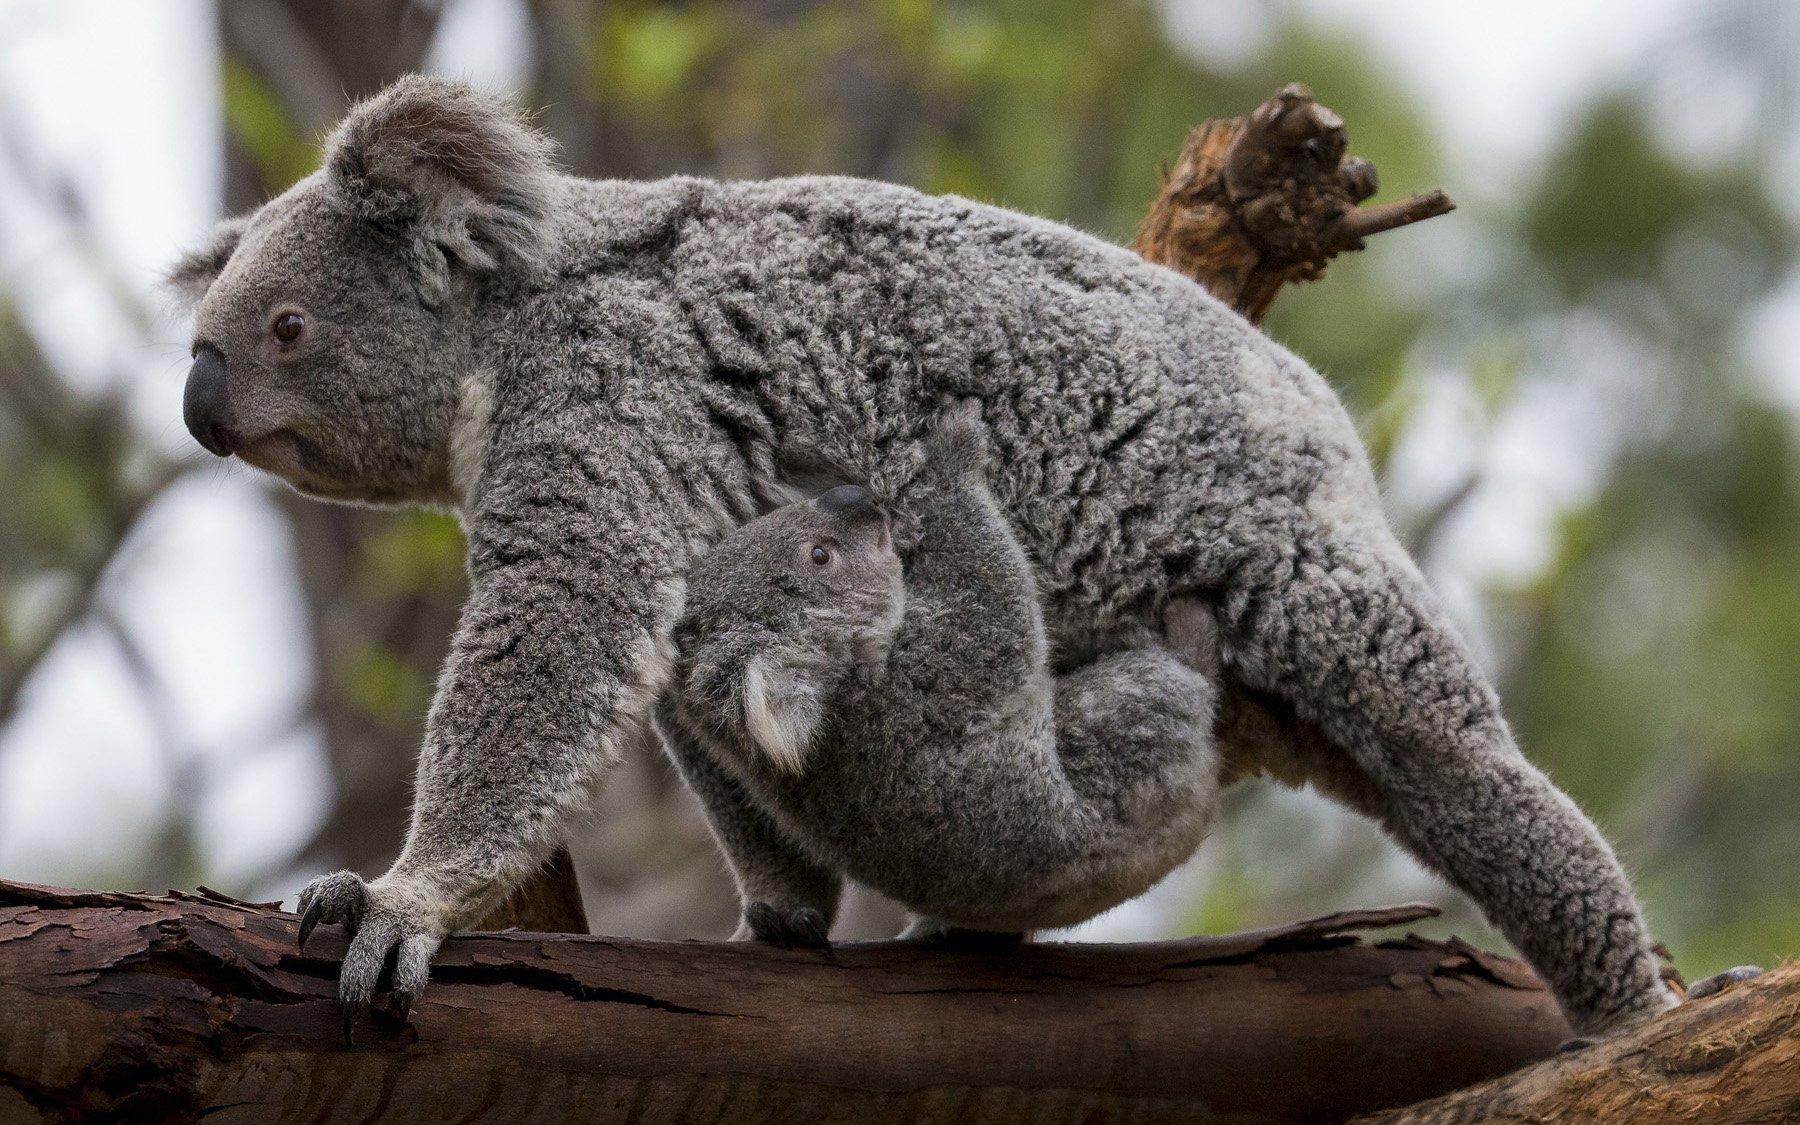 Koala baby f wallpaper 1800x1125 348860 WallpaperUP 1800x1125